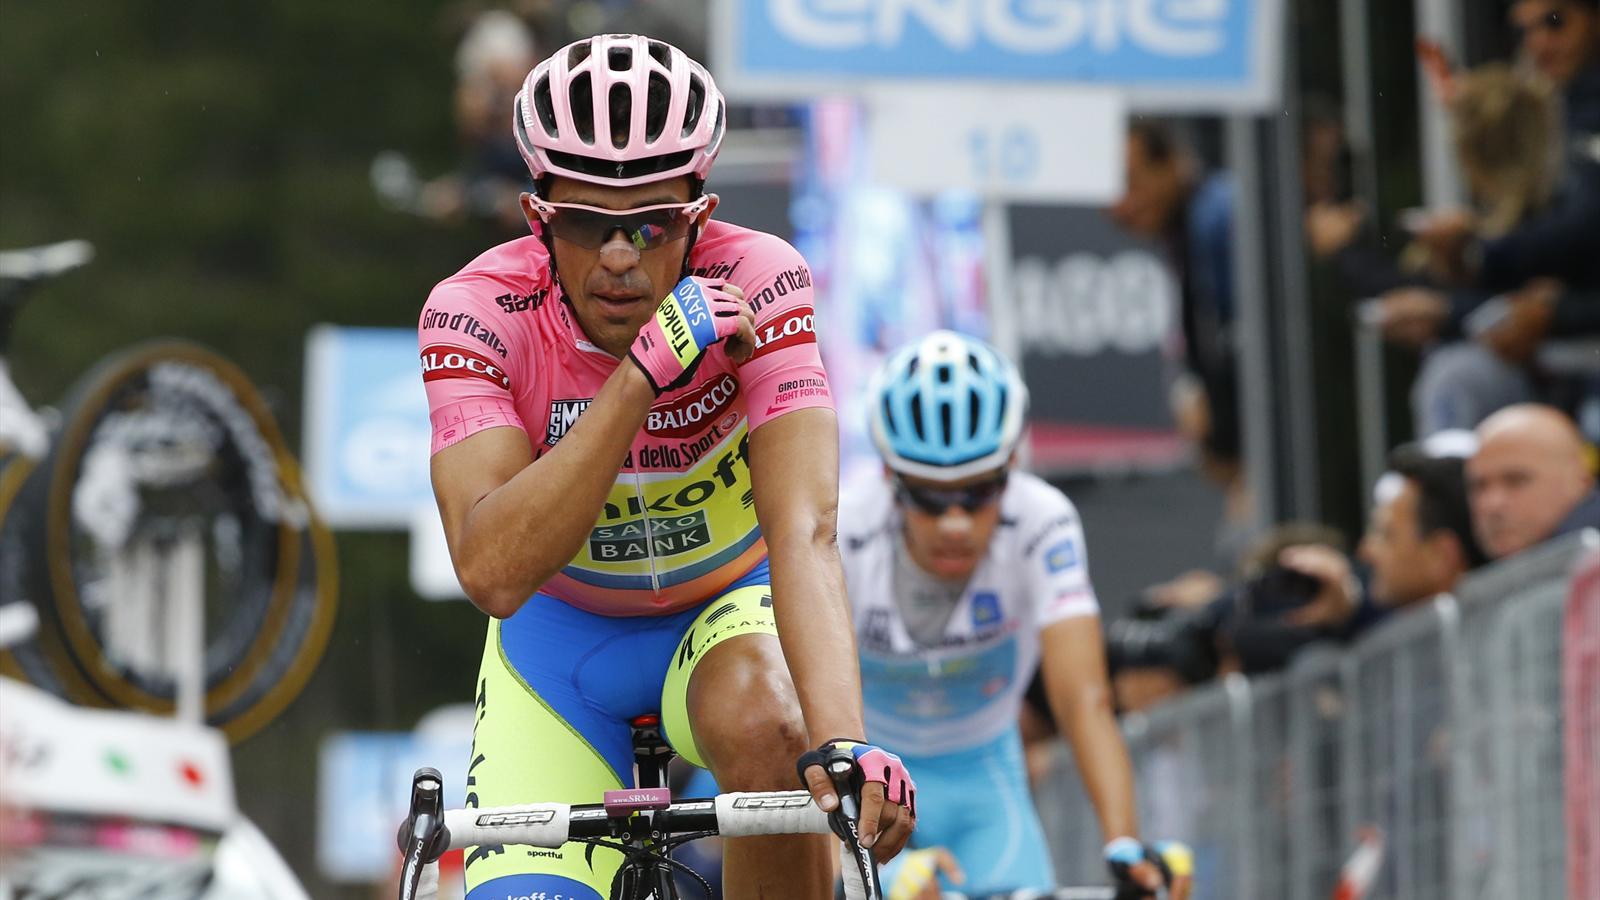 Tour d'Italie - GIRO 2015 - Étape 16 en direct live streaming